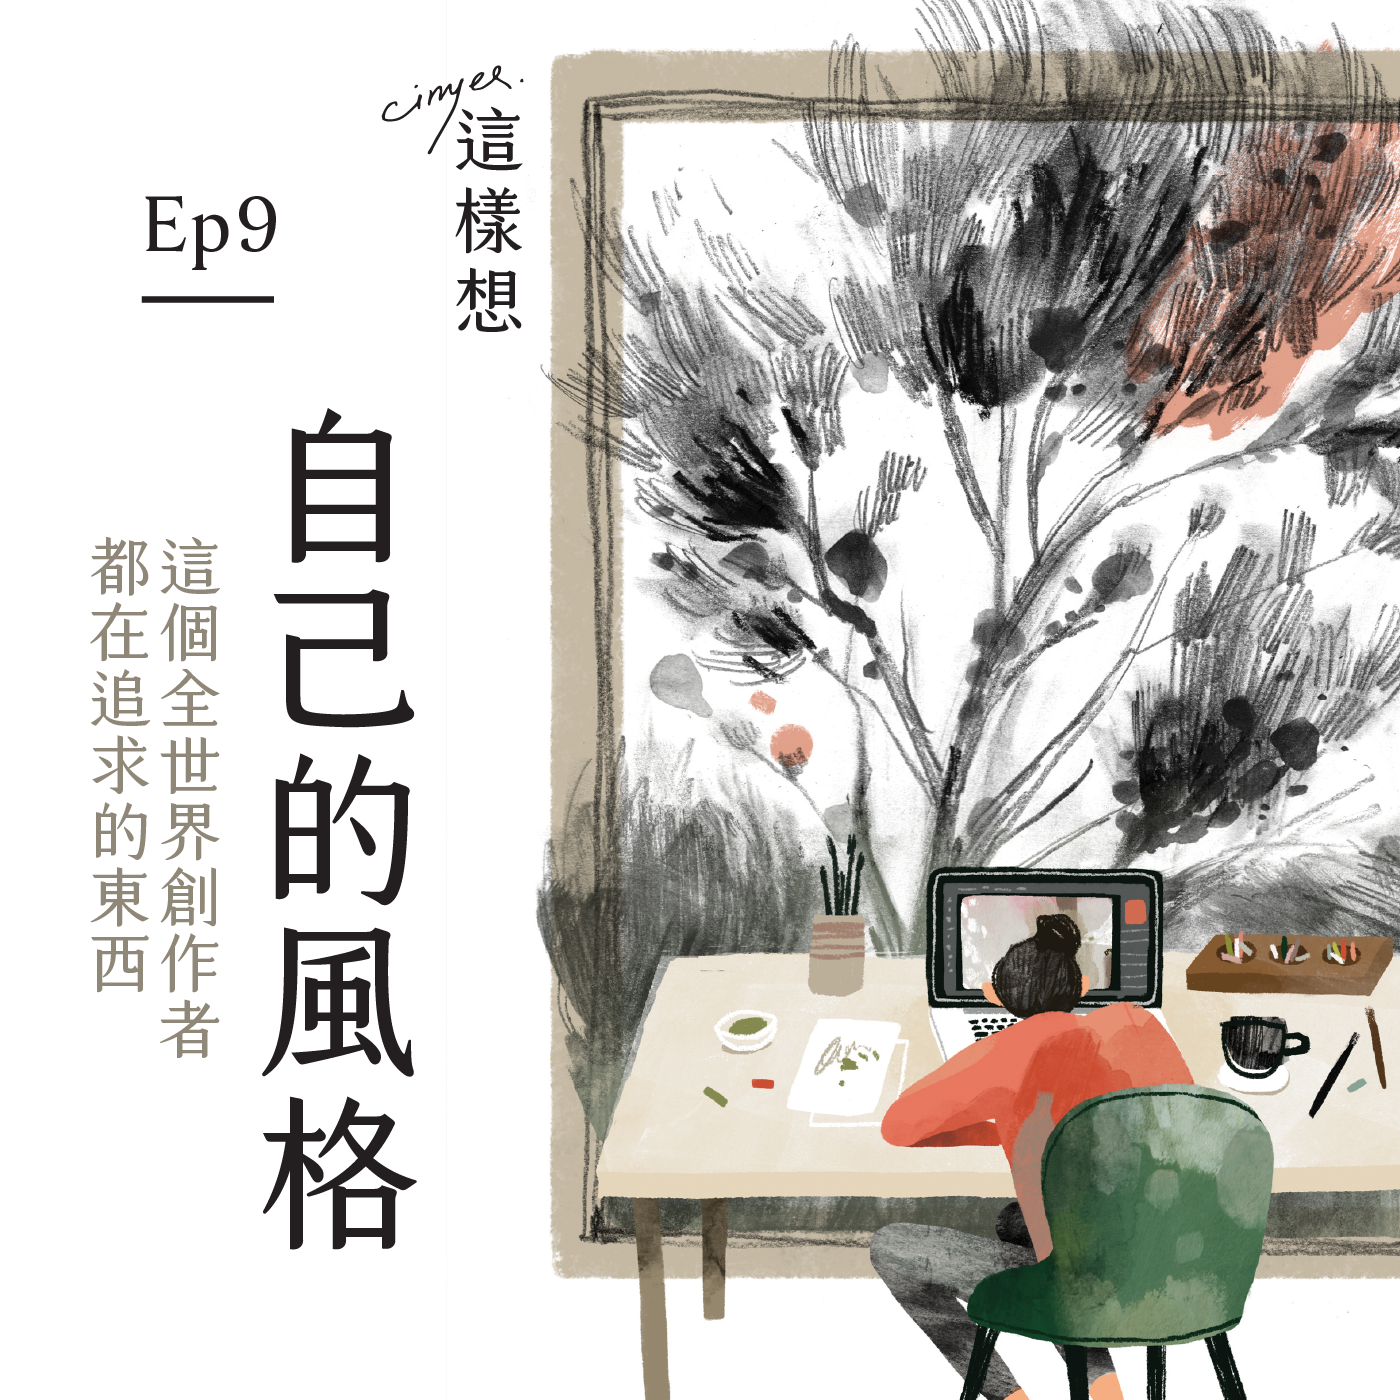 Ep9|自己的「風格」—— 這個全世界創作者都在追求的東西